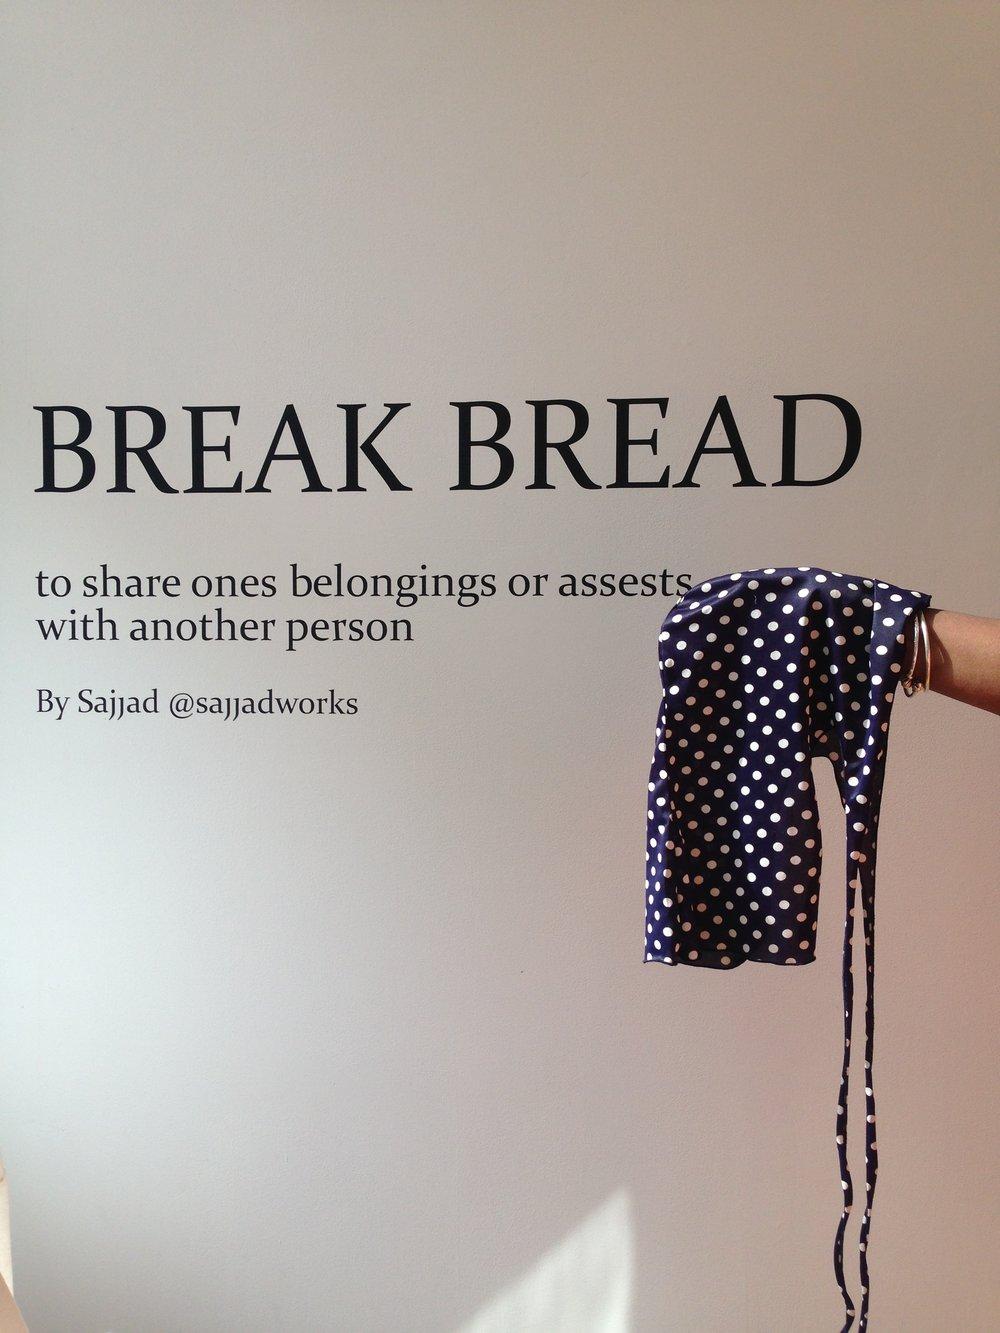 break-bread-event-17.jpg